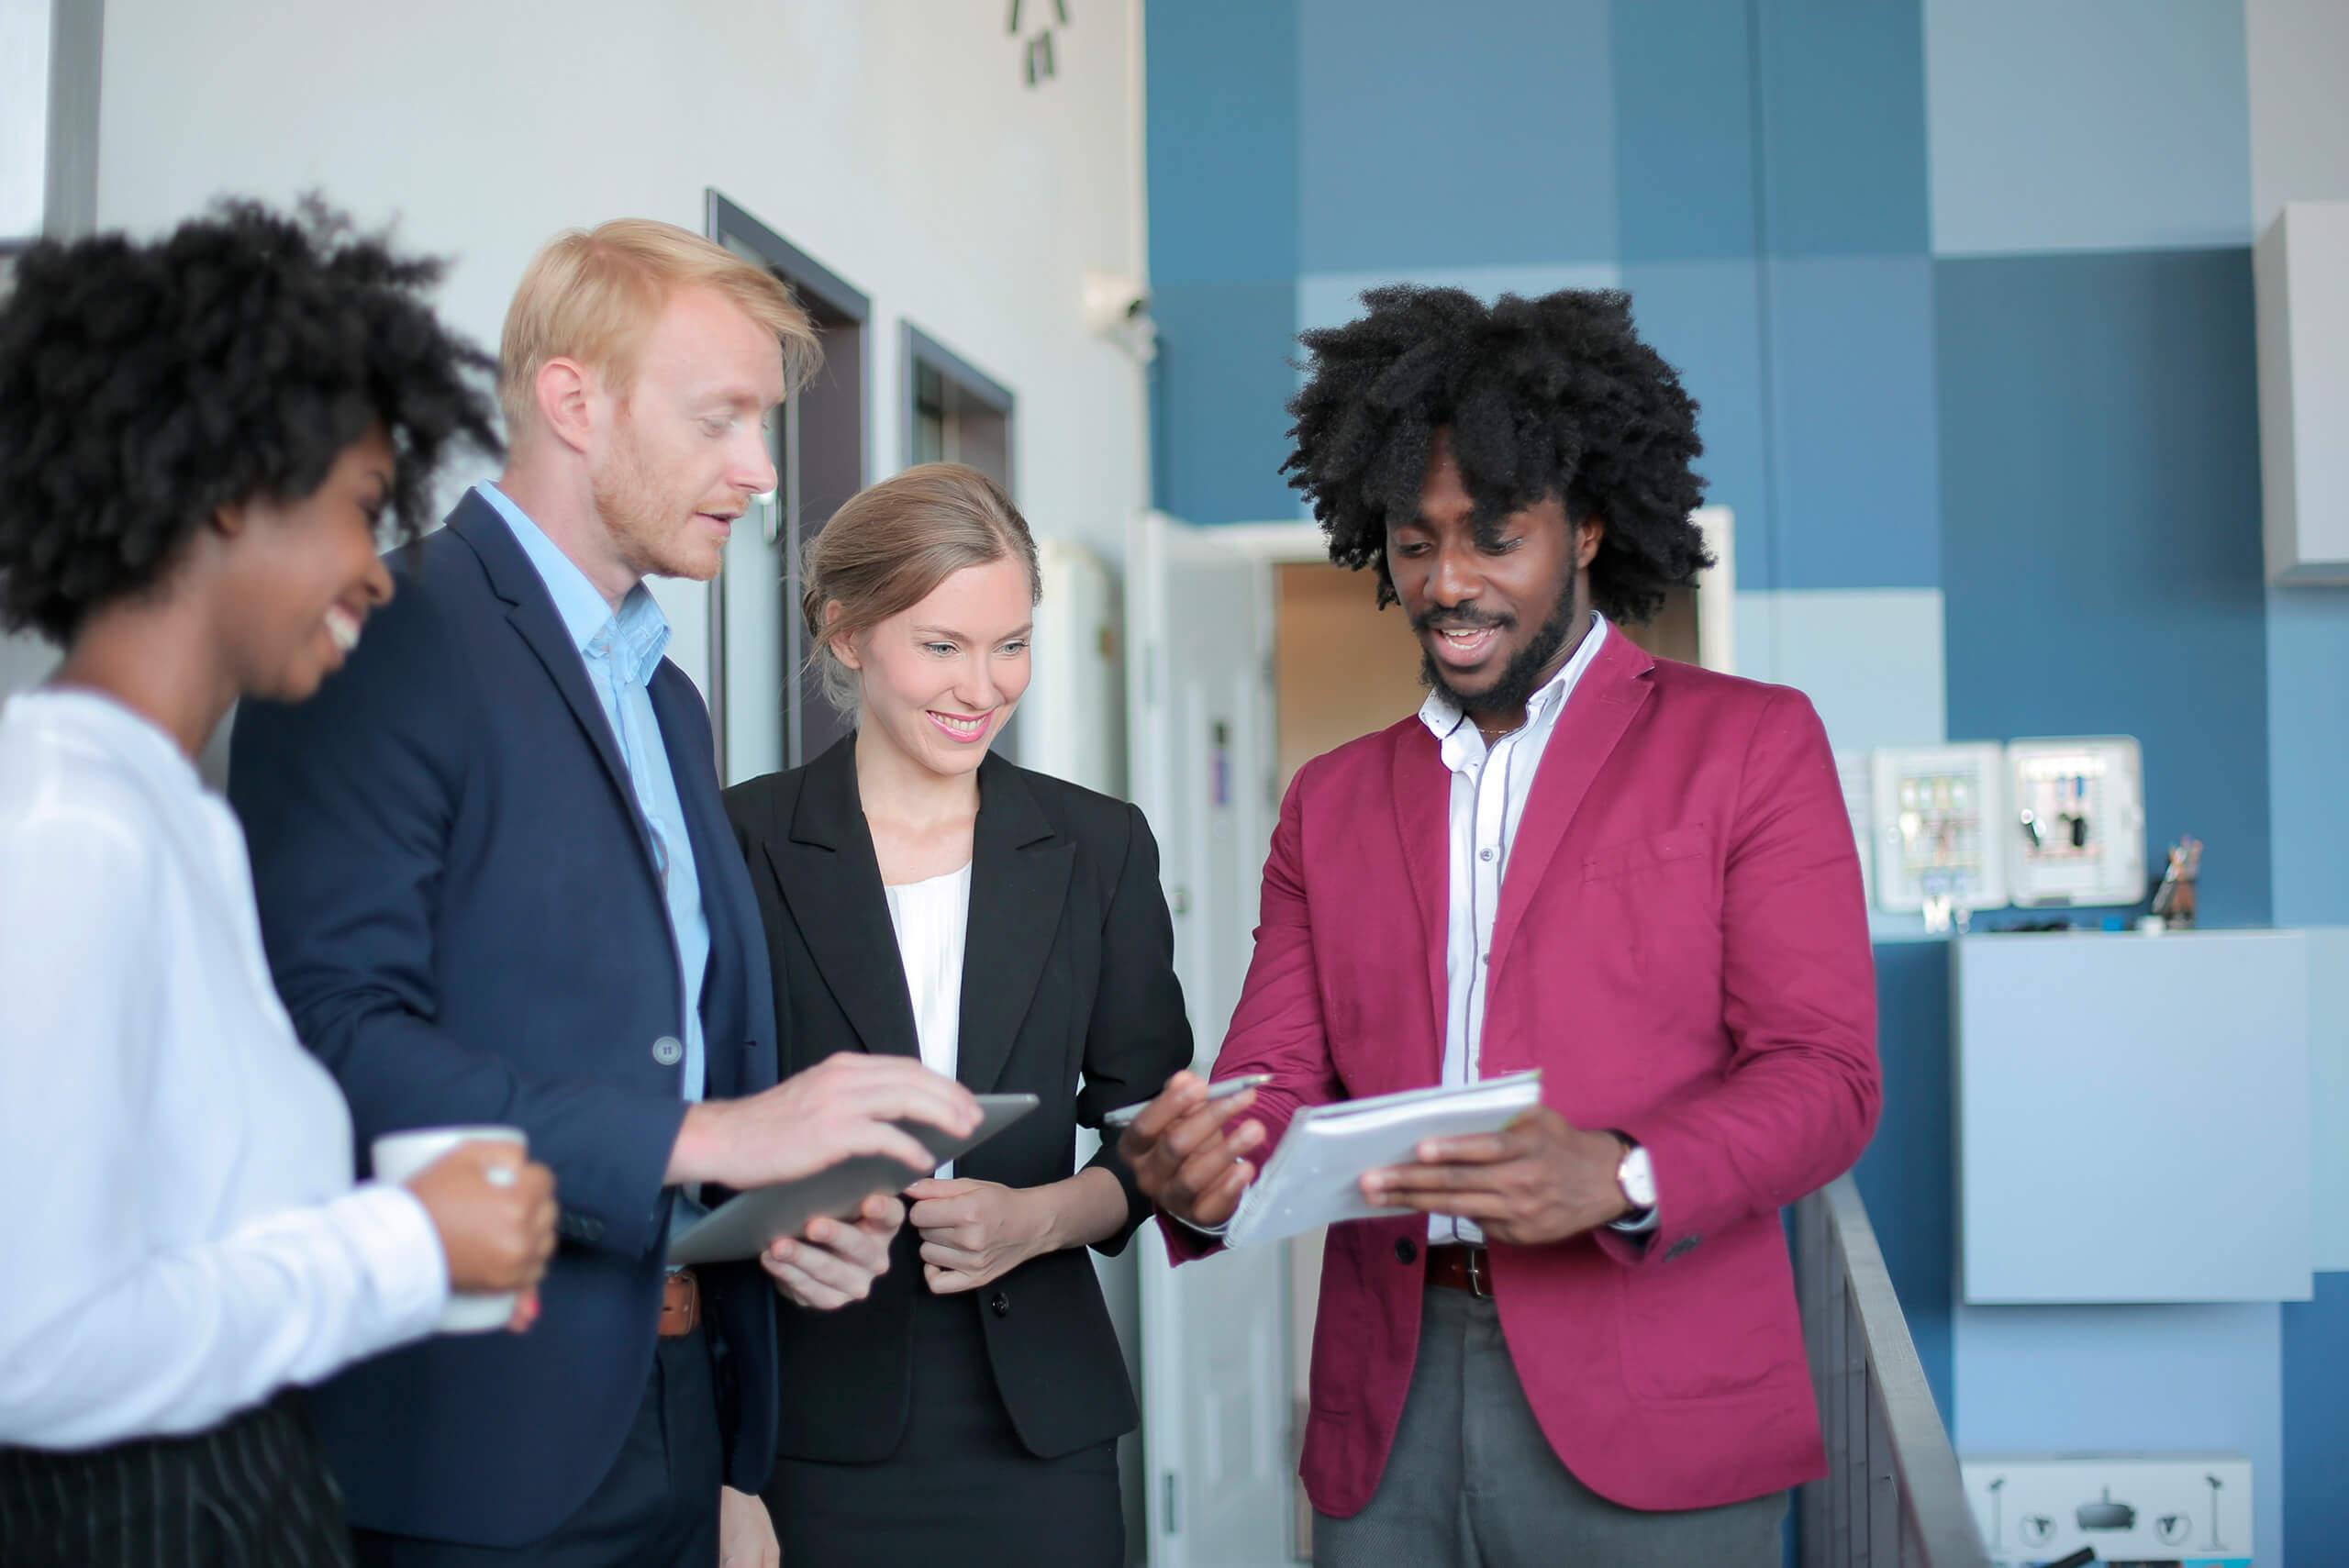 Como a diversidade no ambiente de trabalho potencializa resultados